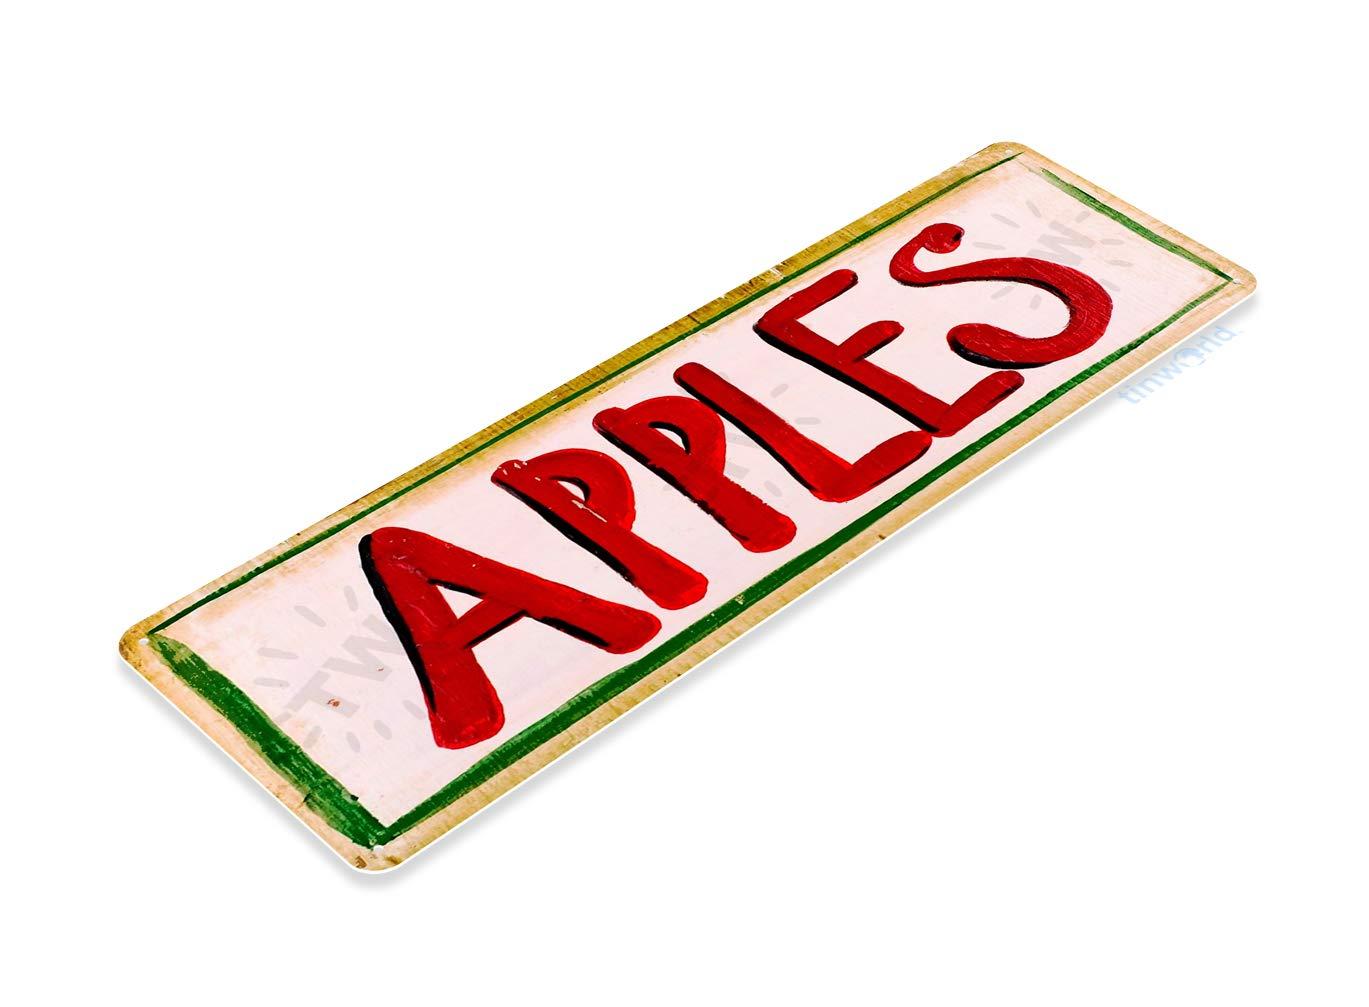 Tinworld Tin Sign Apples Paint Rustic Garden Metal Sign Decor Kitchen Cottage Market Farm Shop B018